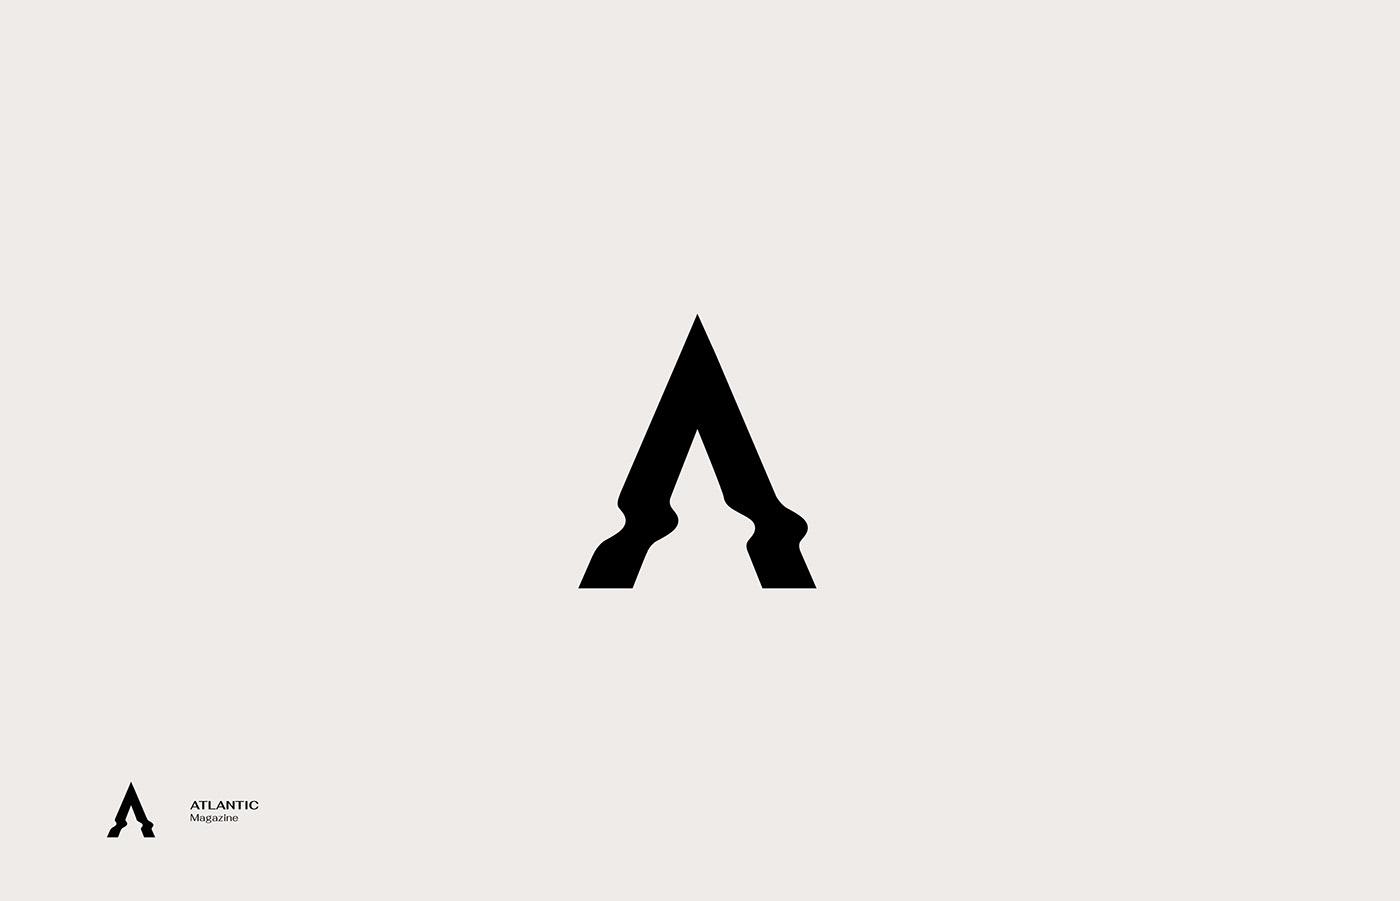 Atlantic - logo for magazine